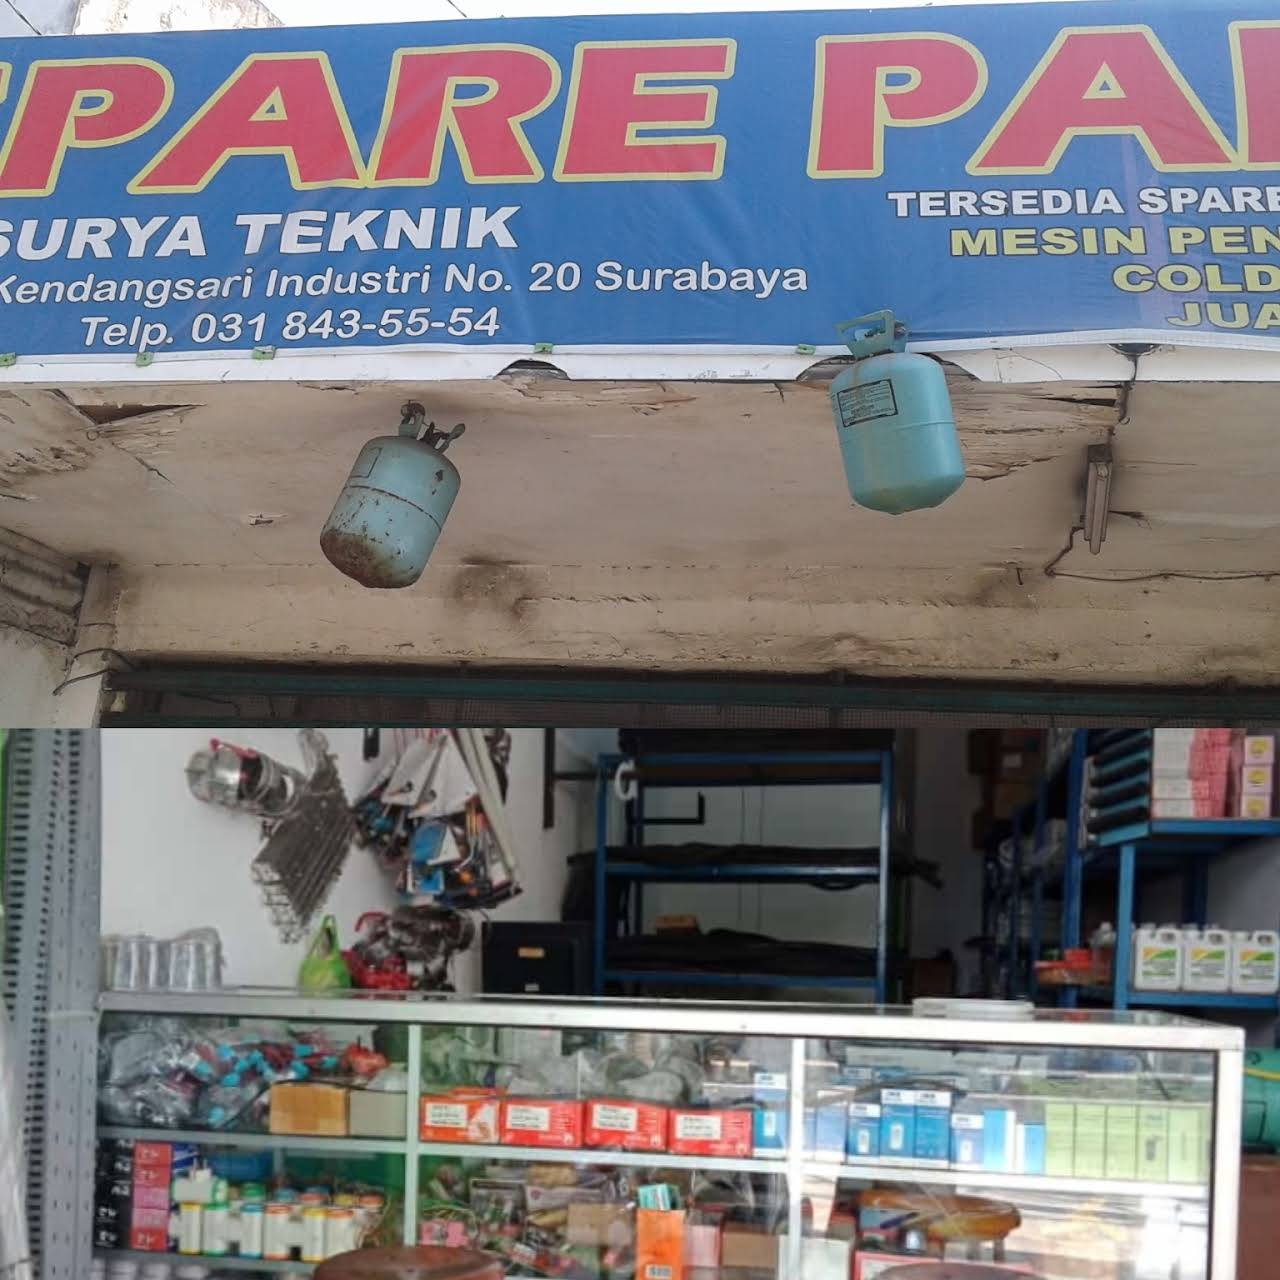 Toko Surya Teknik Spare Part Ac Air